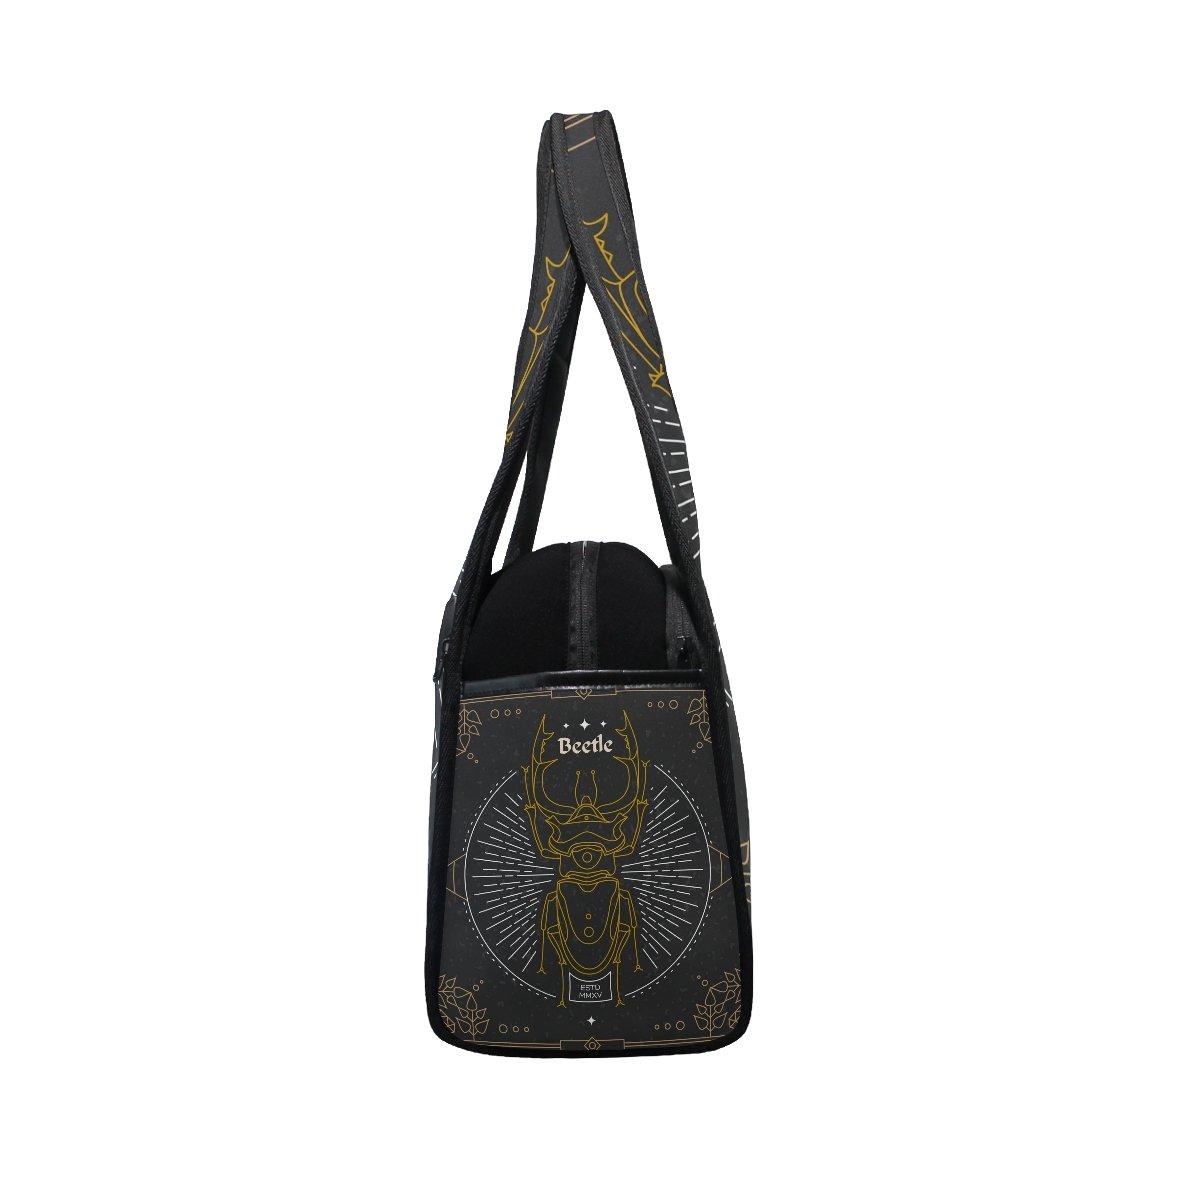 AHOMY Canvas Sports Gym Bag Vintage Mysterious Animal Travel Shoulder Bag